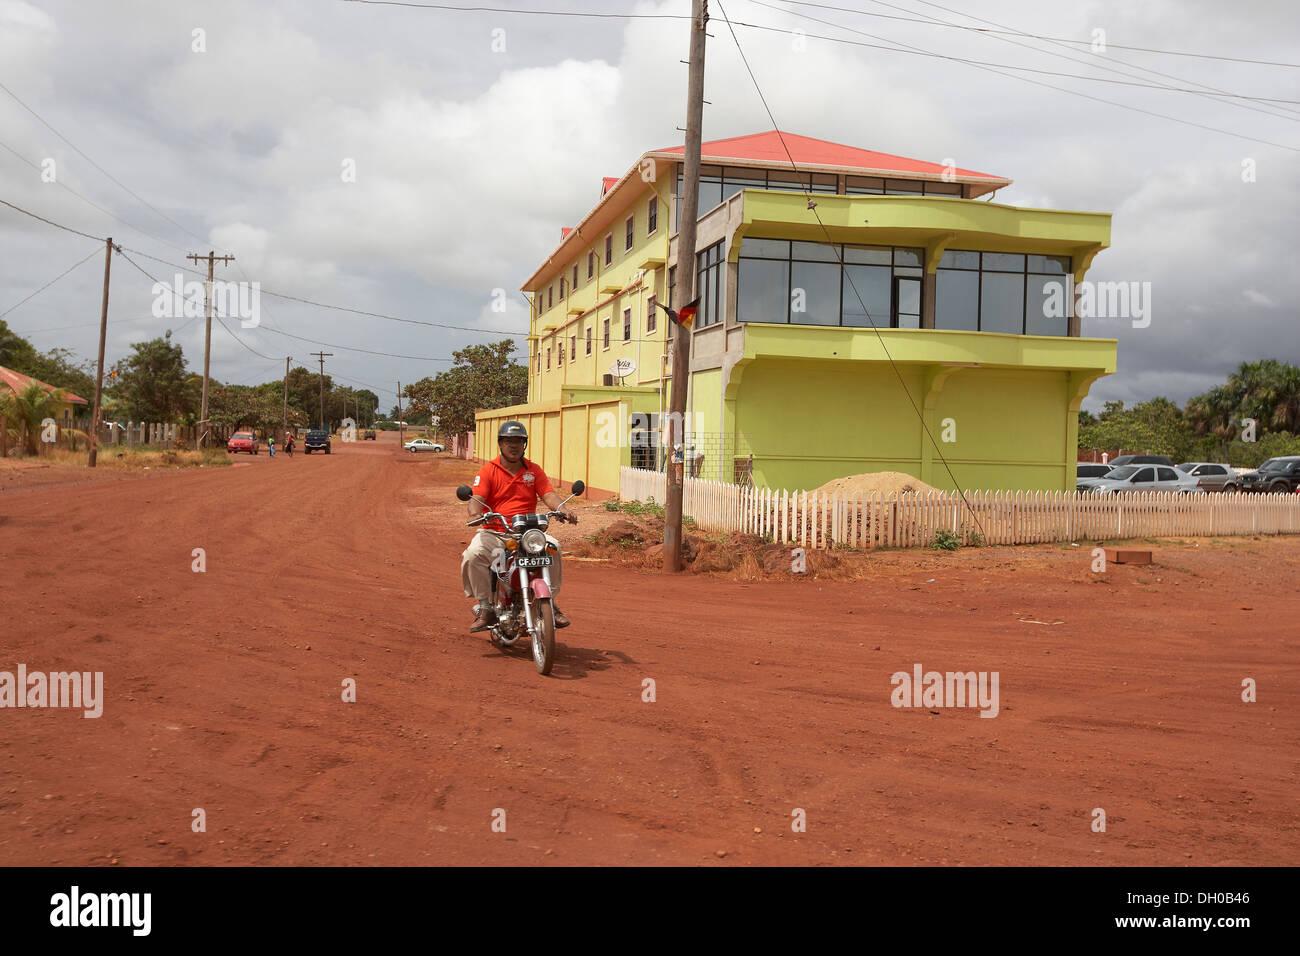 street scenes in Letham, Guyana, South America - Stock Image